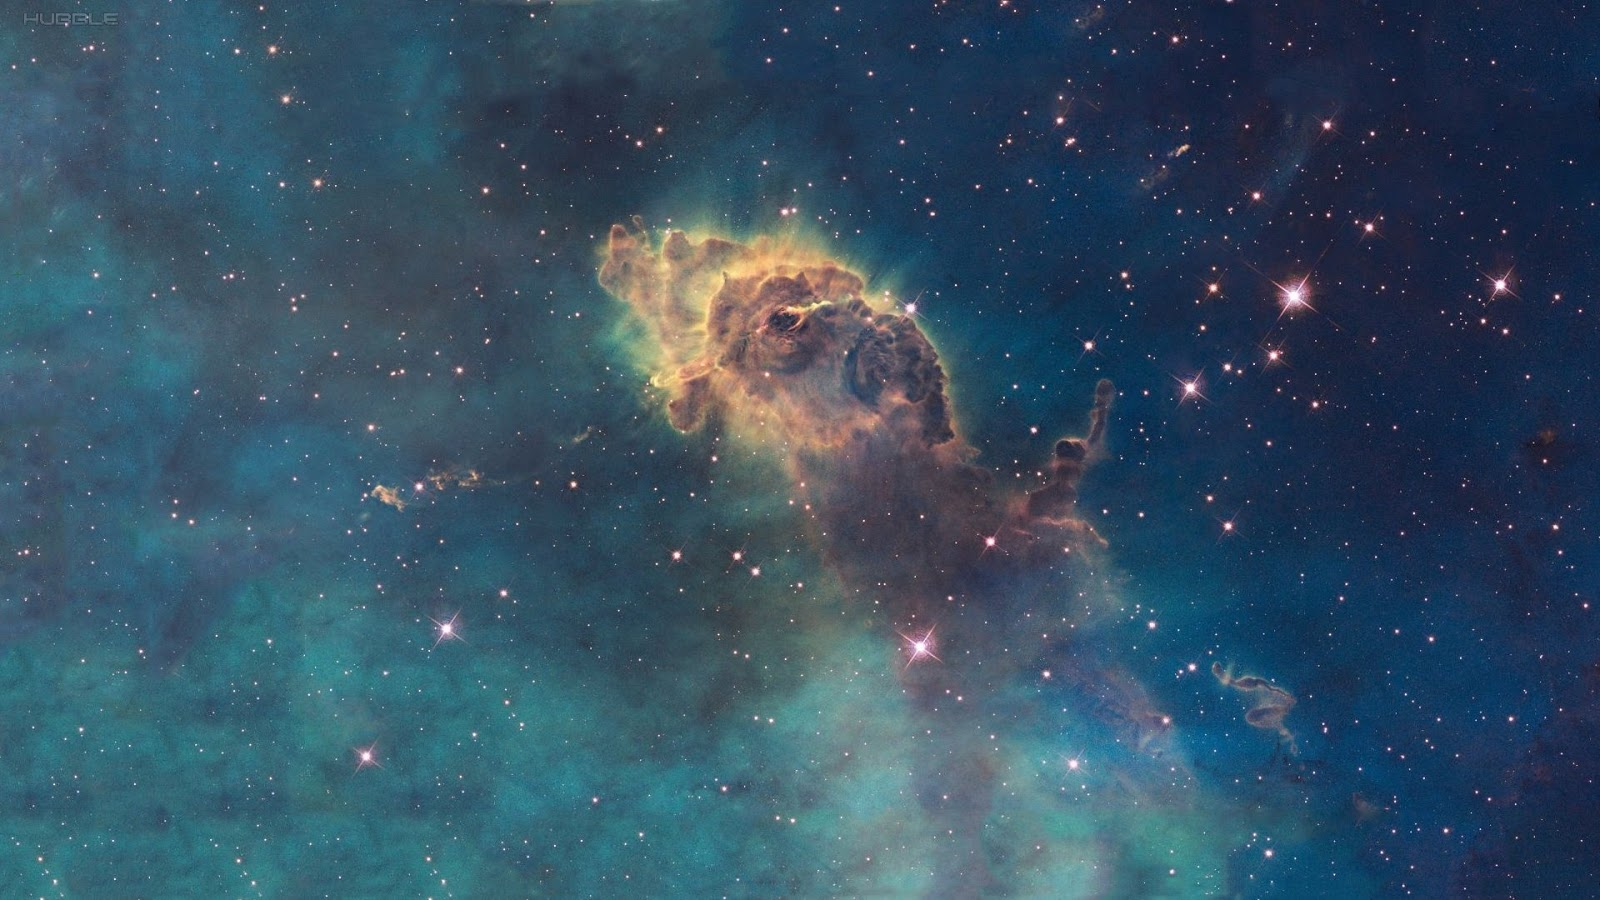 carina nebula - wallpaper hd | earth blog